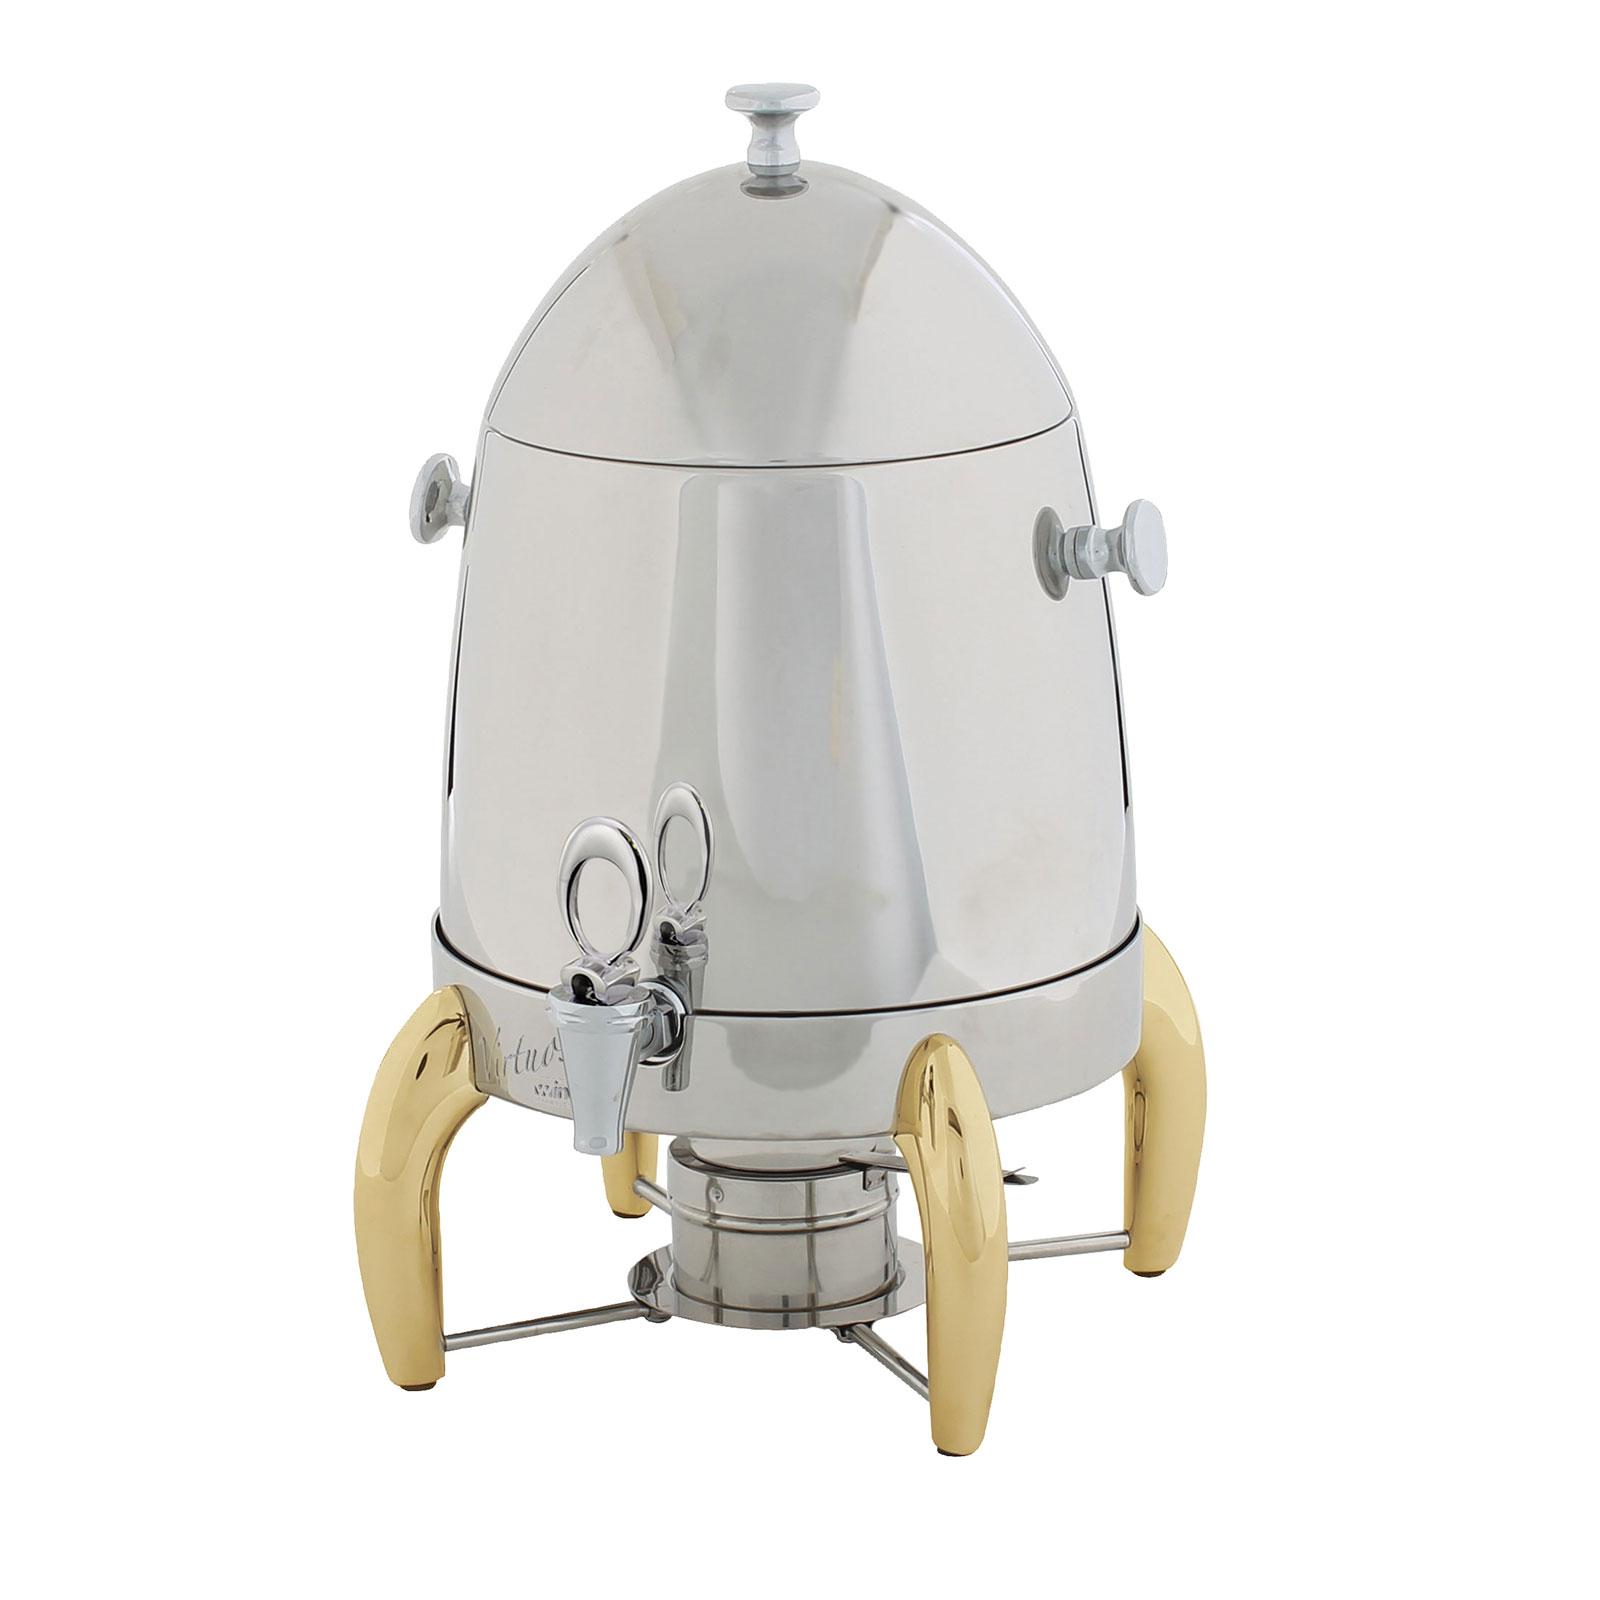 Winco 903A coffee chafer urn